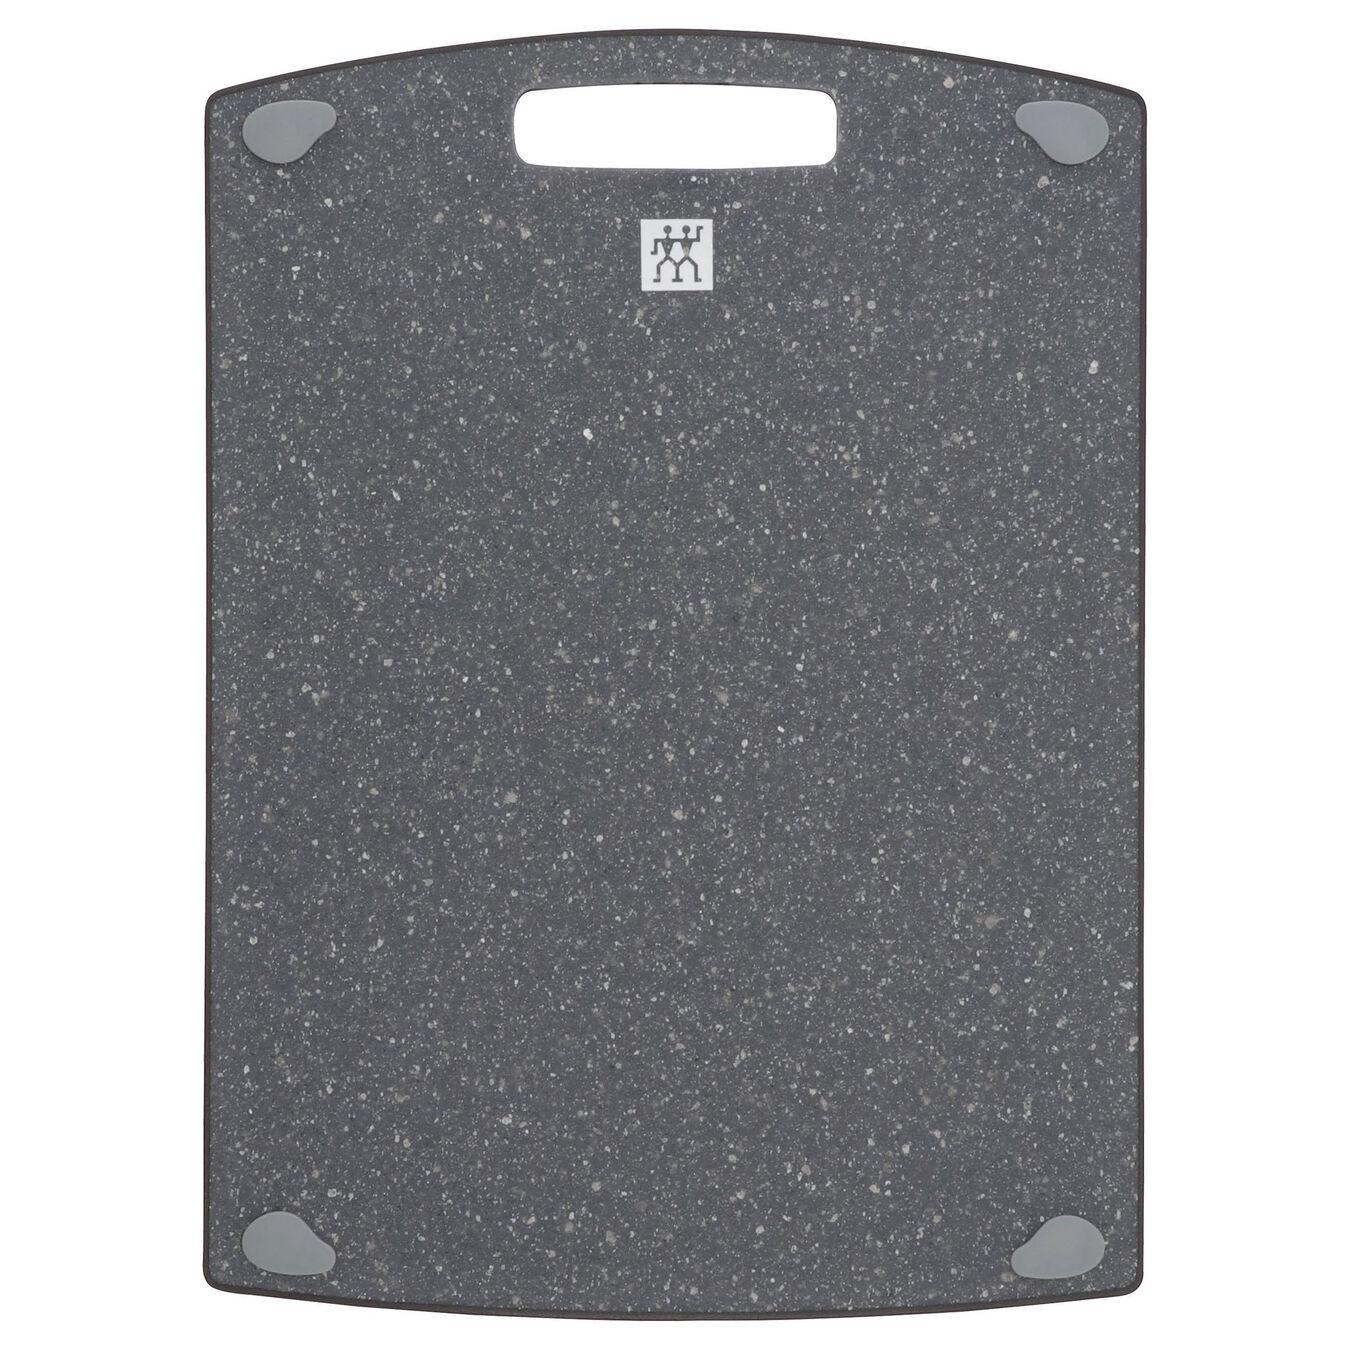 2 pc. Cutting board set, Plastic | 36 cm x 20 cm & 37 cm x 27 cm 36 cm x 20 cm Plastic,,large 4